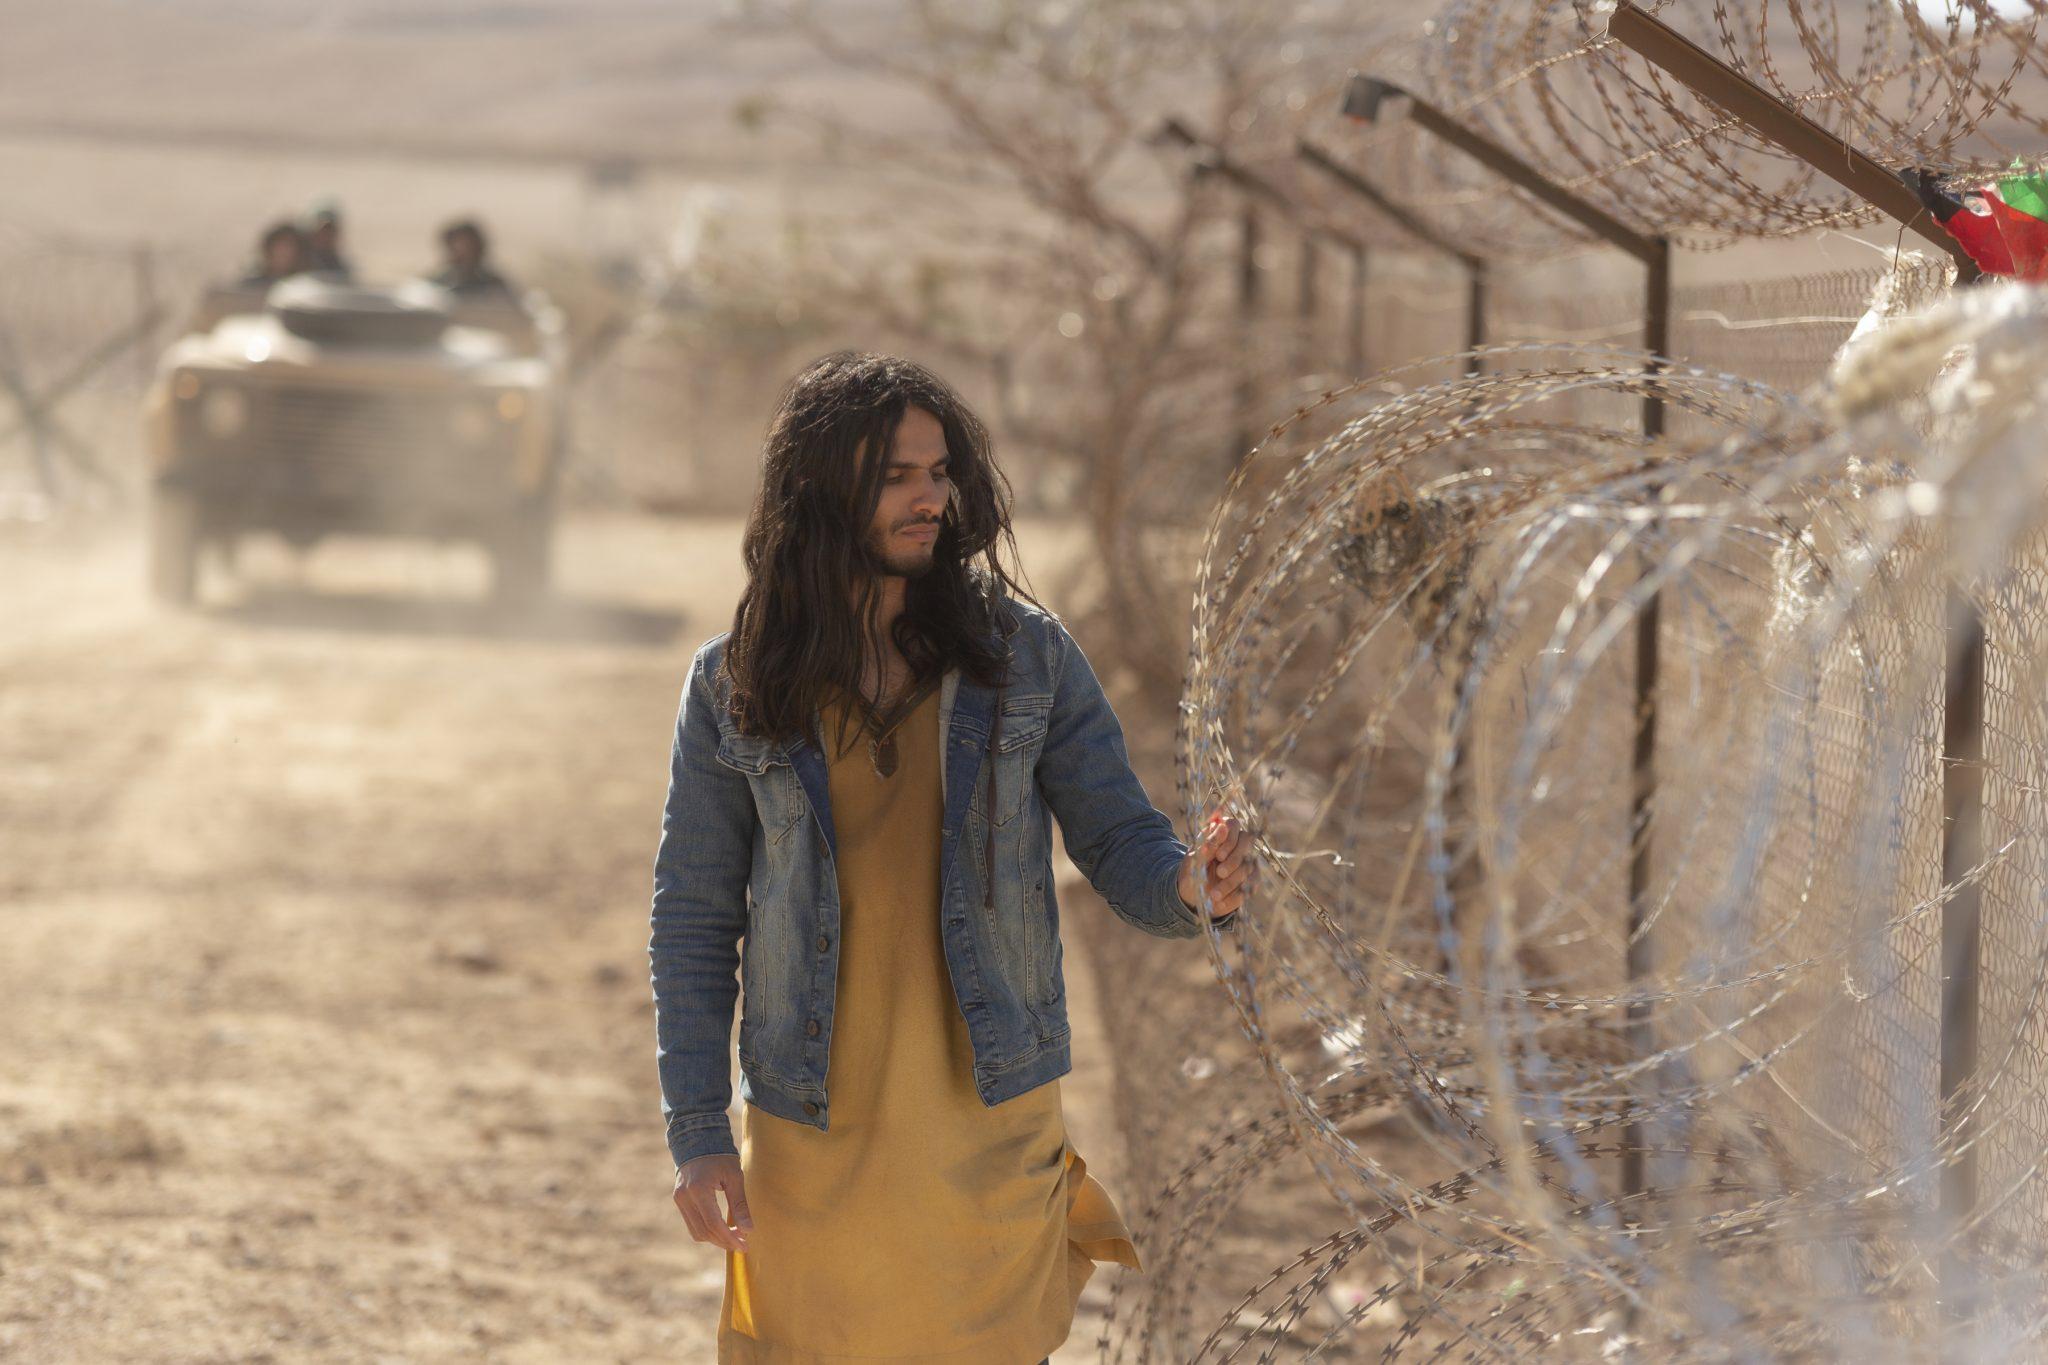 Der Messiah Al Masih geht am Grenzzaun Israels entlang